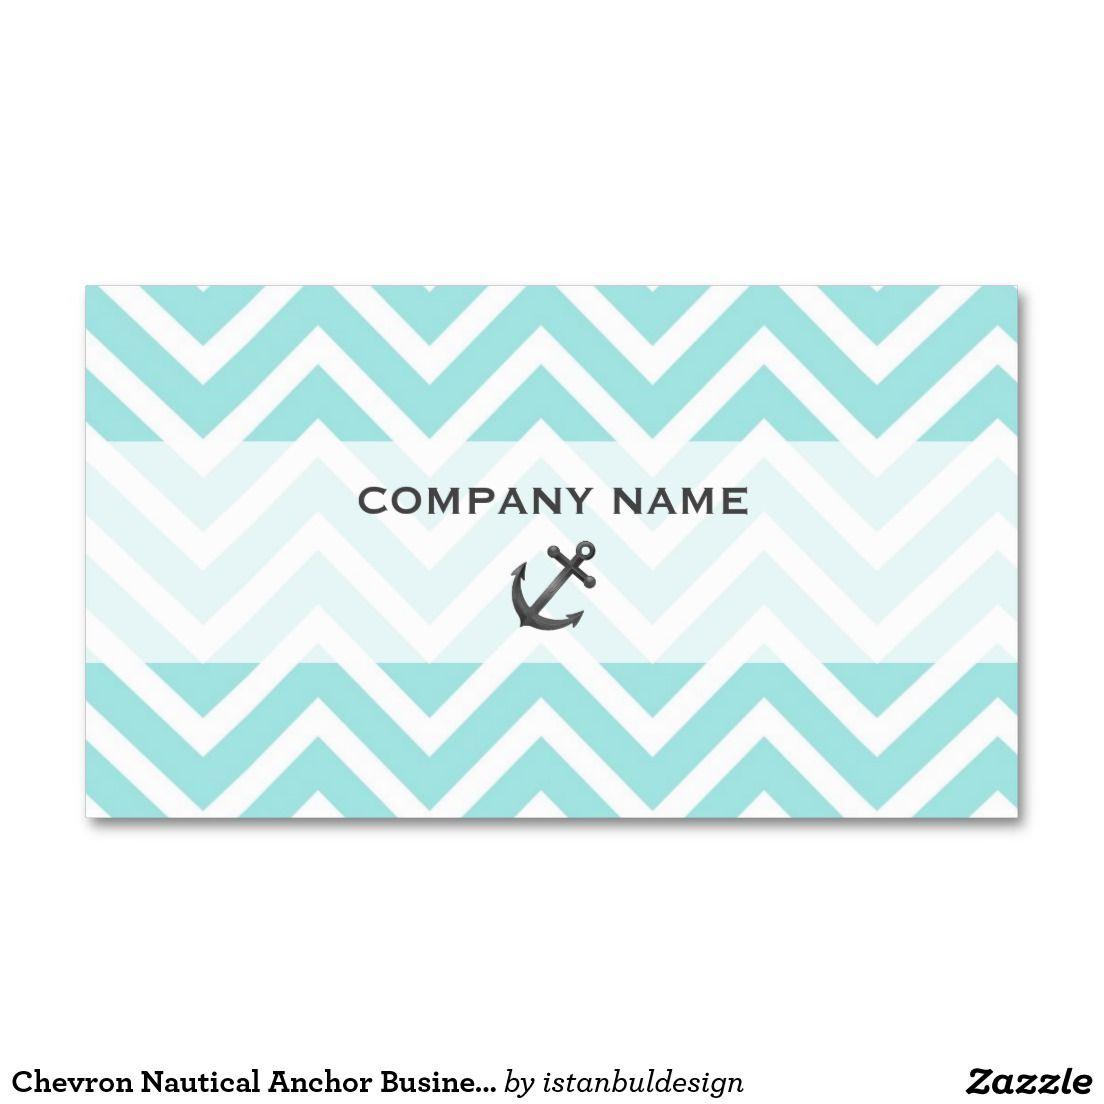 Chevron Nautical Anchor Business Card   Nautical Business Cards ...